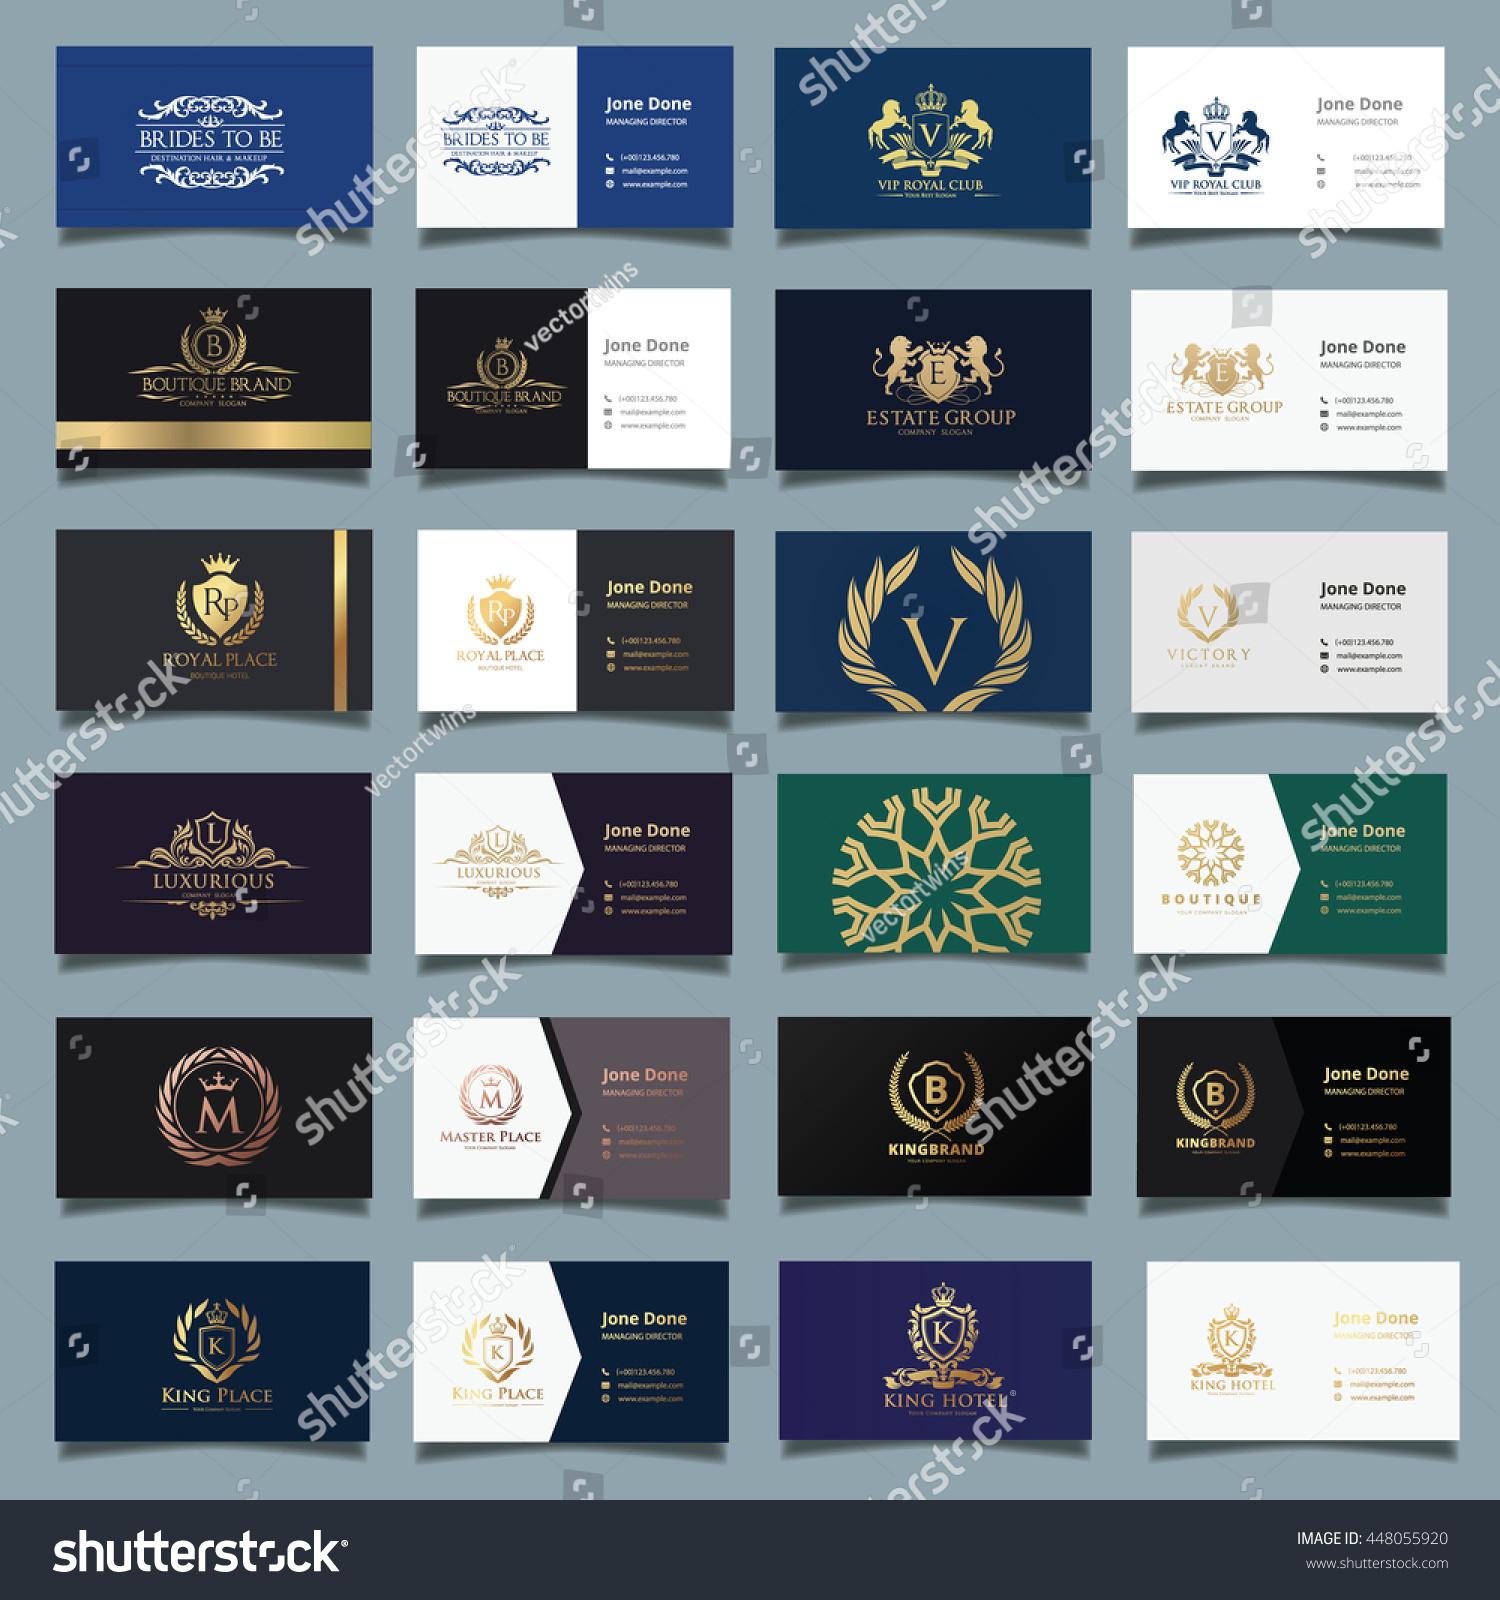 Business Card Template Luxury Logobrand Identitystationary Stock ...